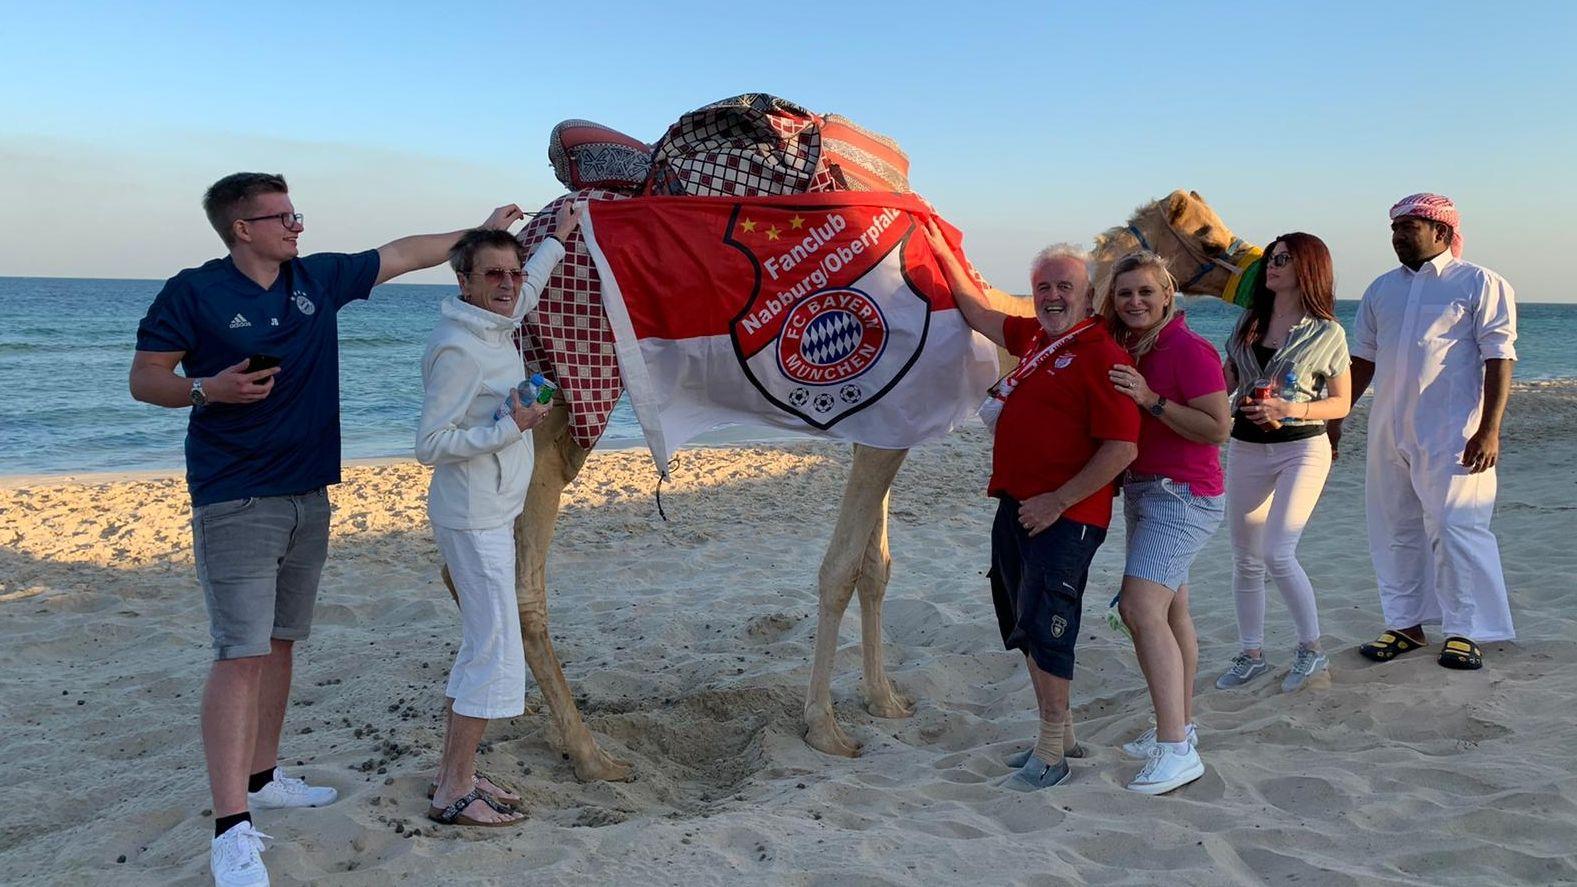 Mitglieder des FC-Bayern-Fanclubs in Doha.